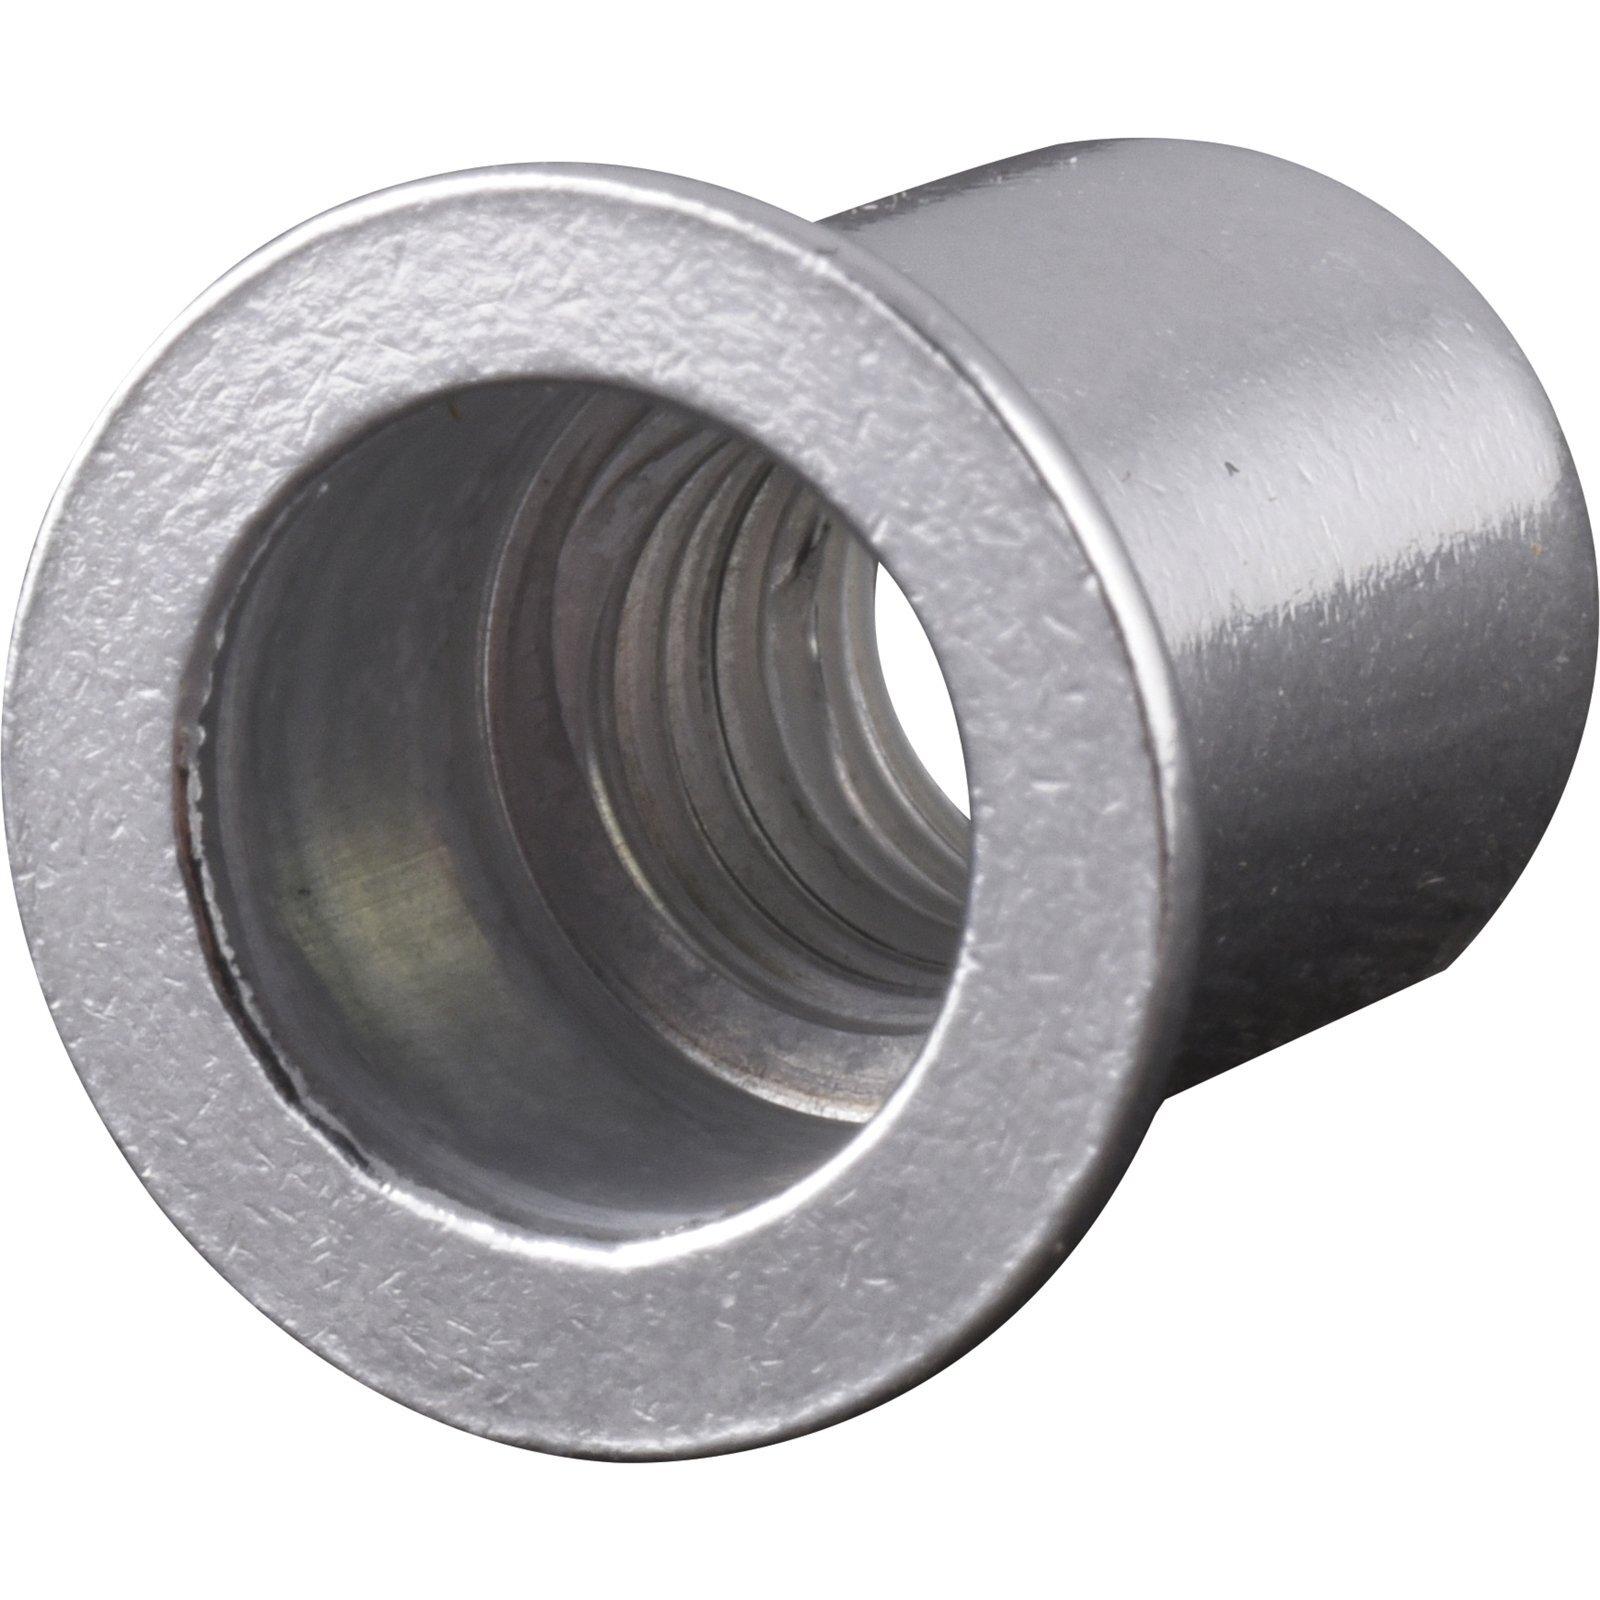 Kincrome M3 20 Piece Rivnut Set